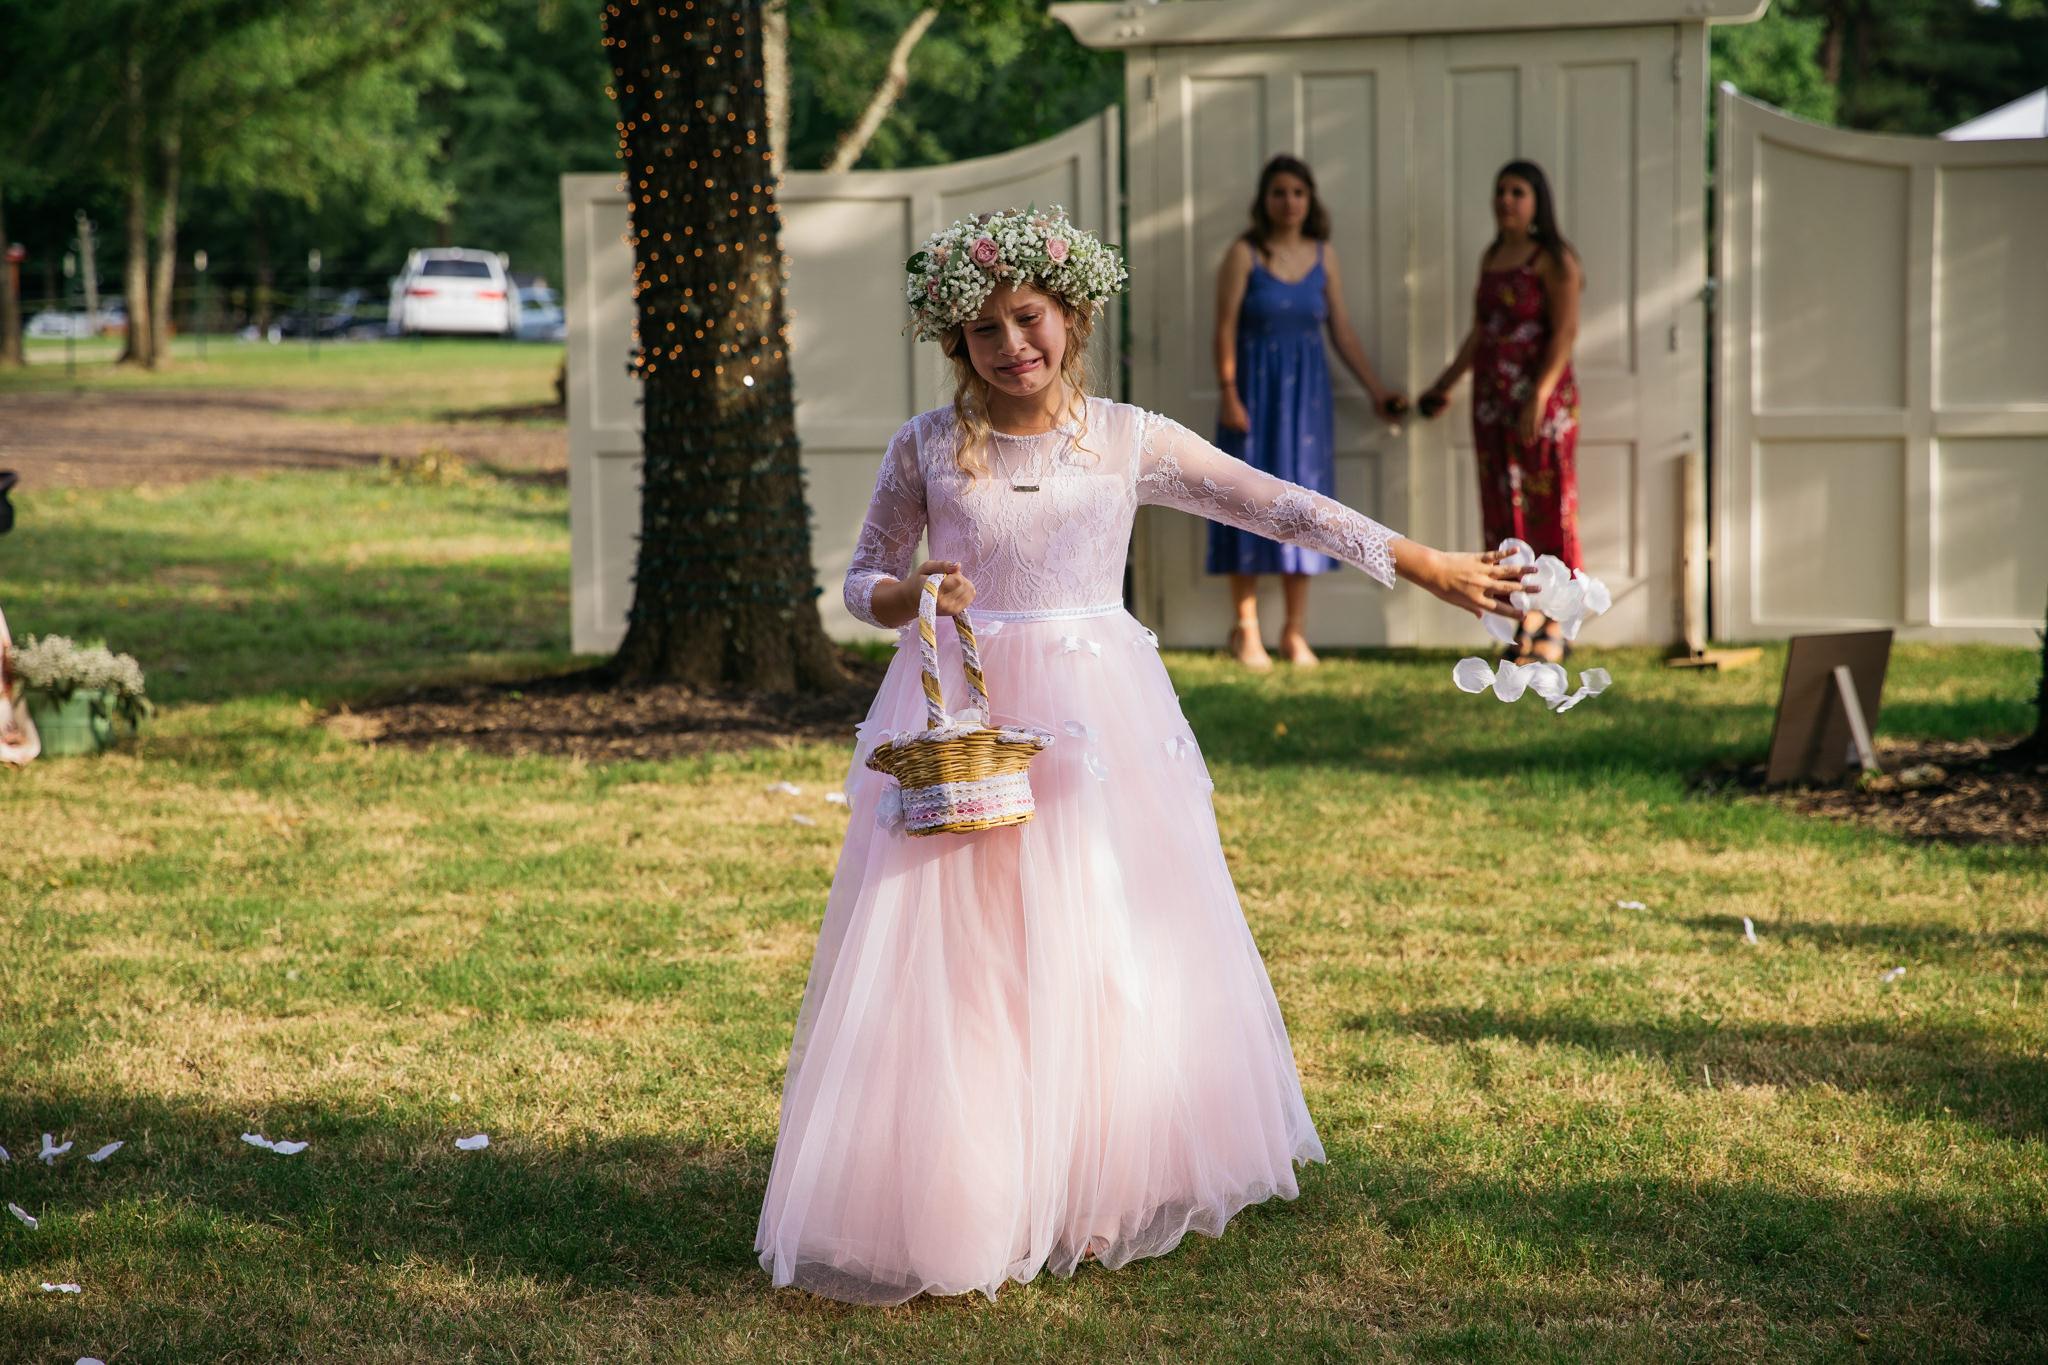 zbackyard-wedding-thewarmtharoundyou-lexy-branson-3.jpg